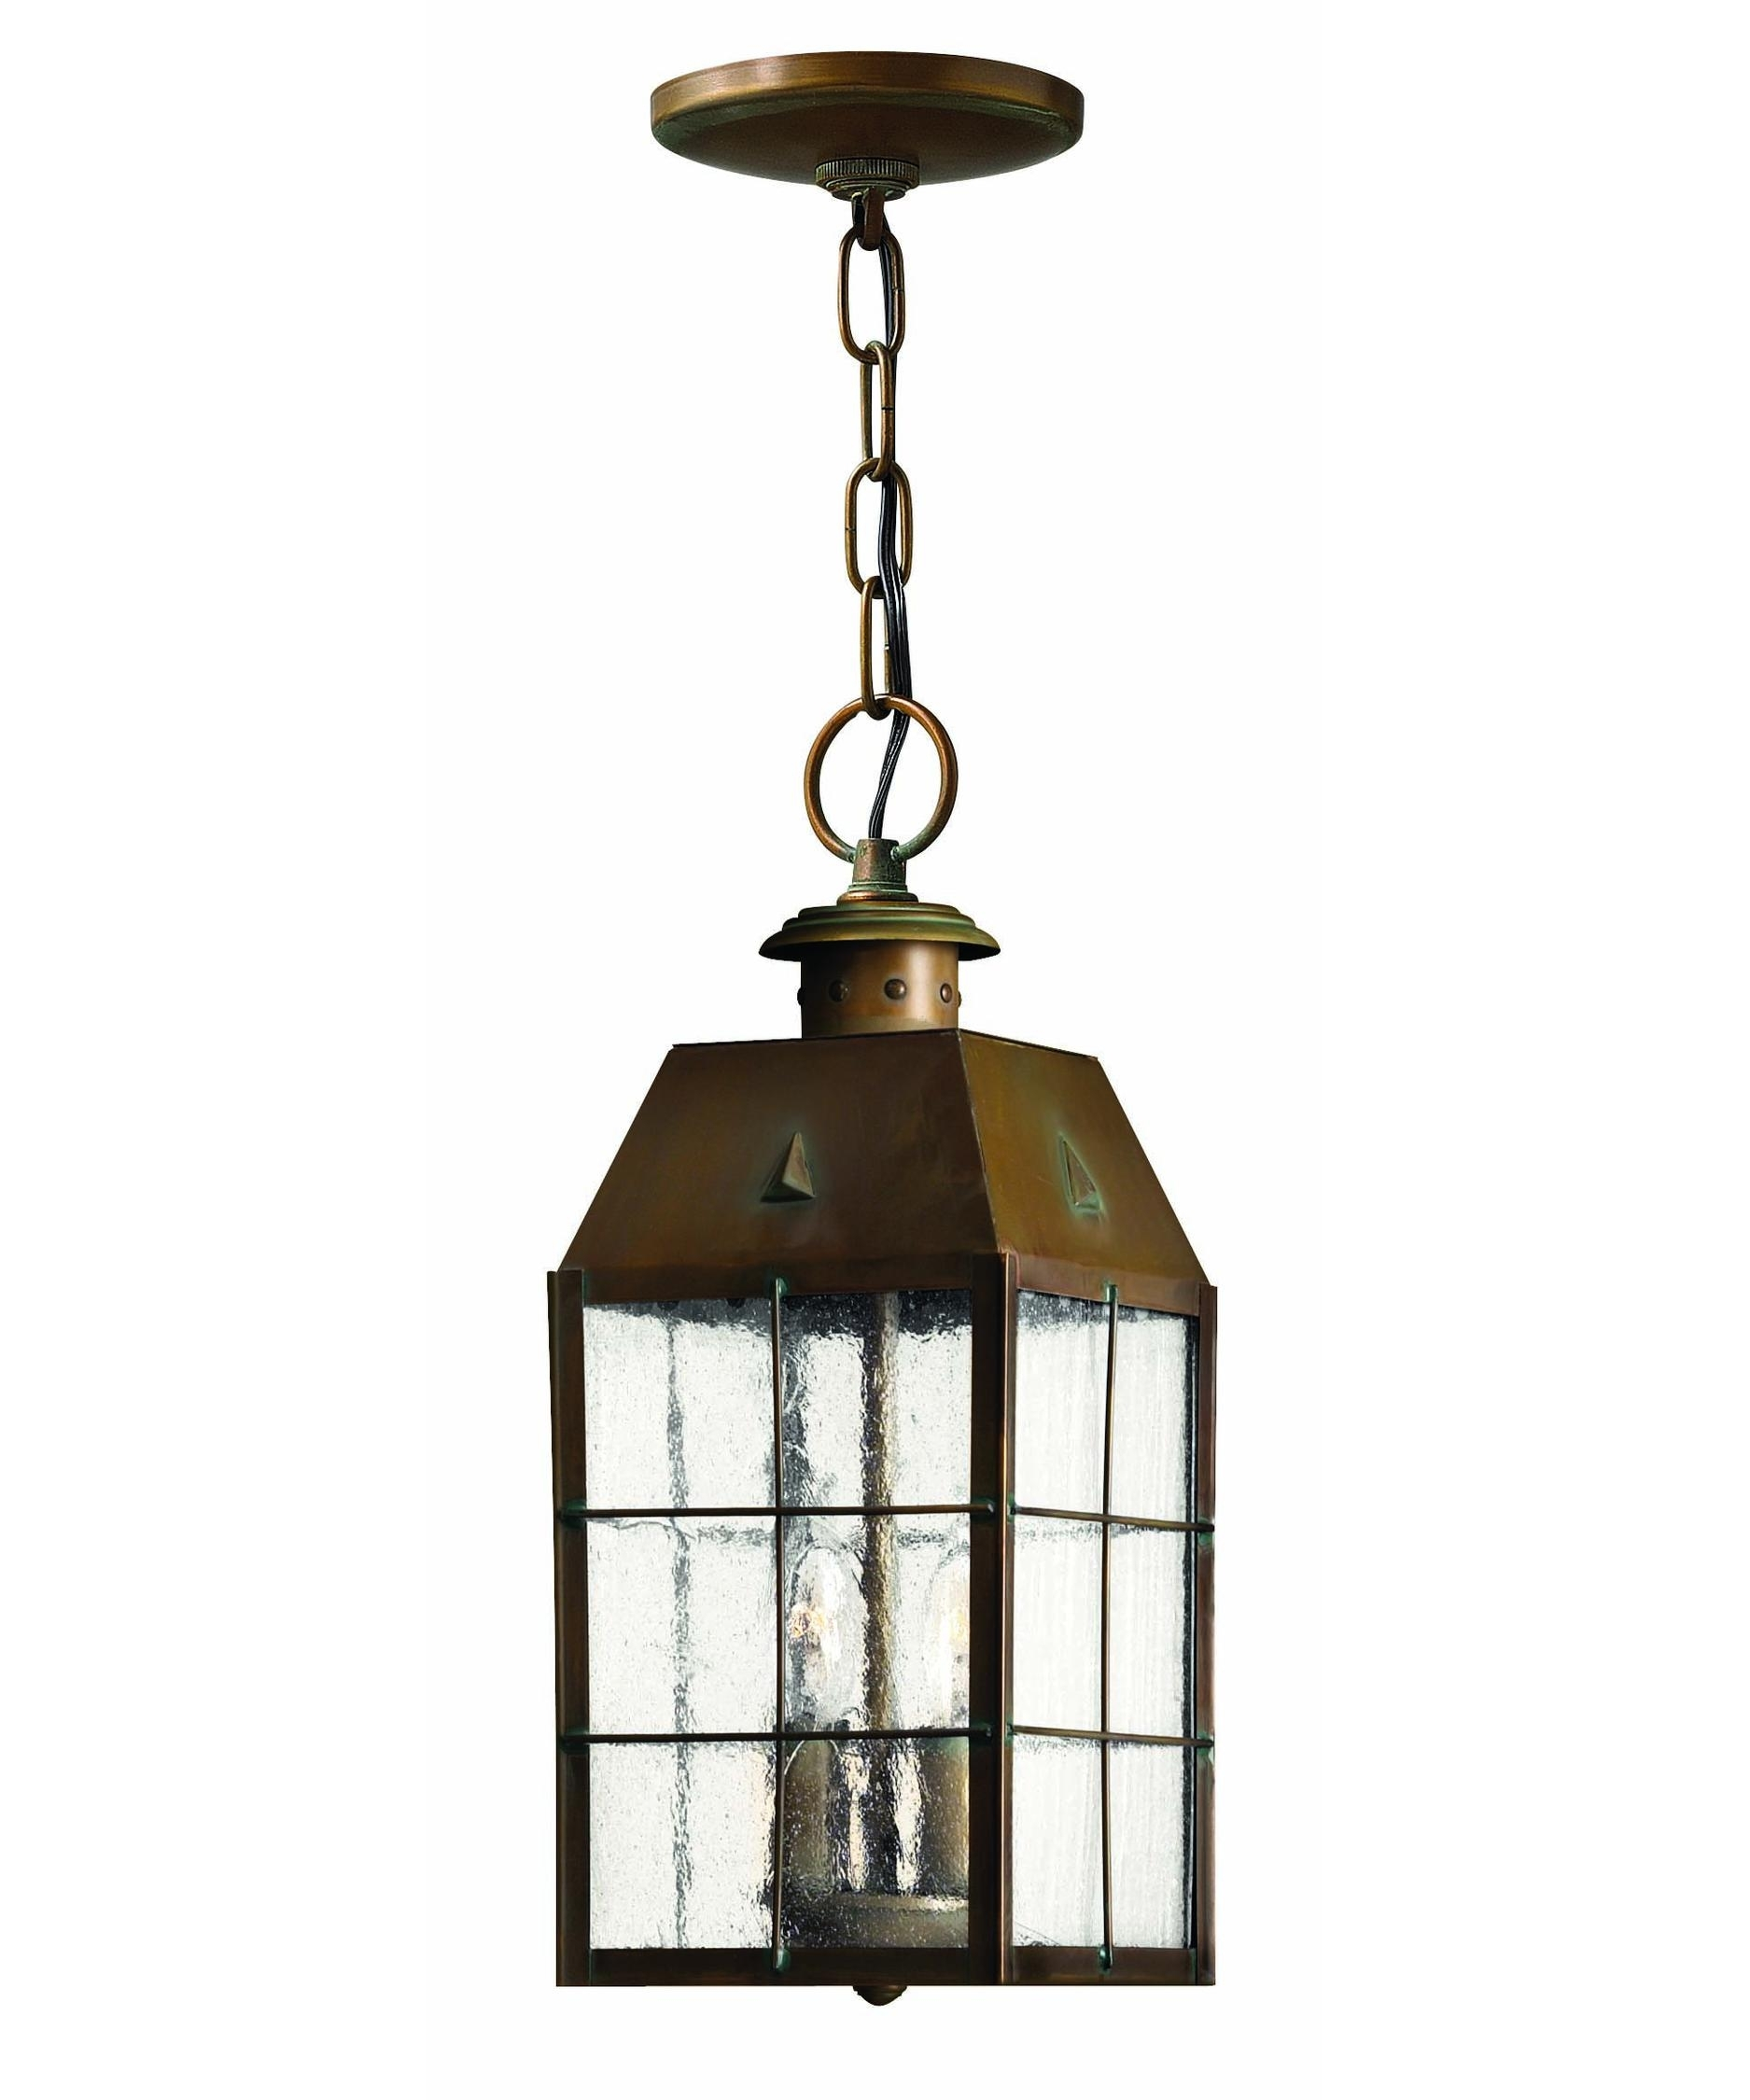 Hinkley Lighting 2372 Nantucket 6 Inch Wide 2 Light Outdoor Hanging For Outdoor Hanging Lantern Lights (View 10 of 15)